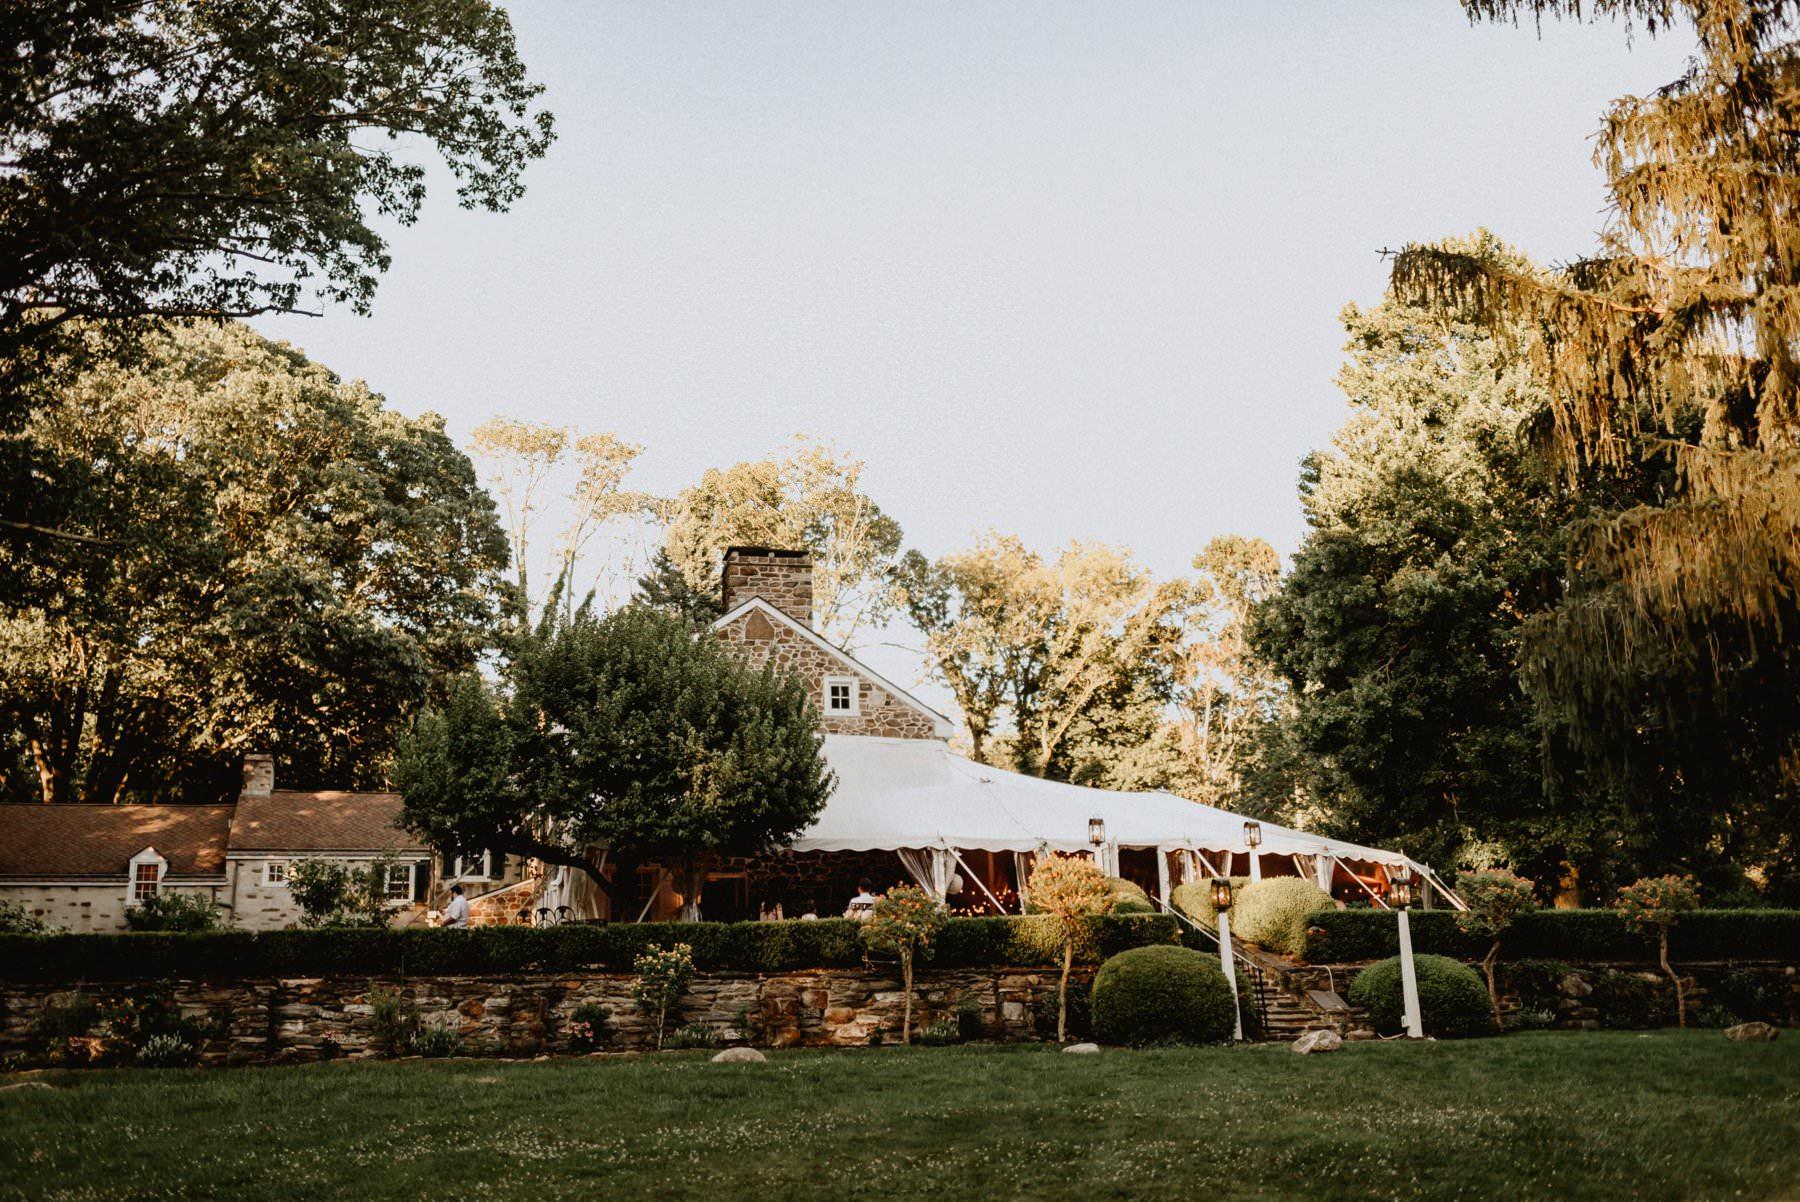 Appleford-estate-wedding-140.jpg